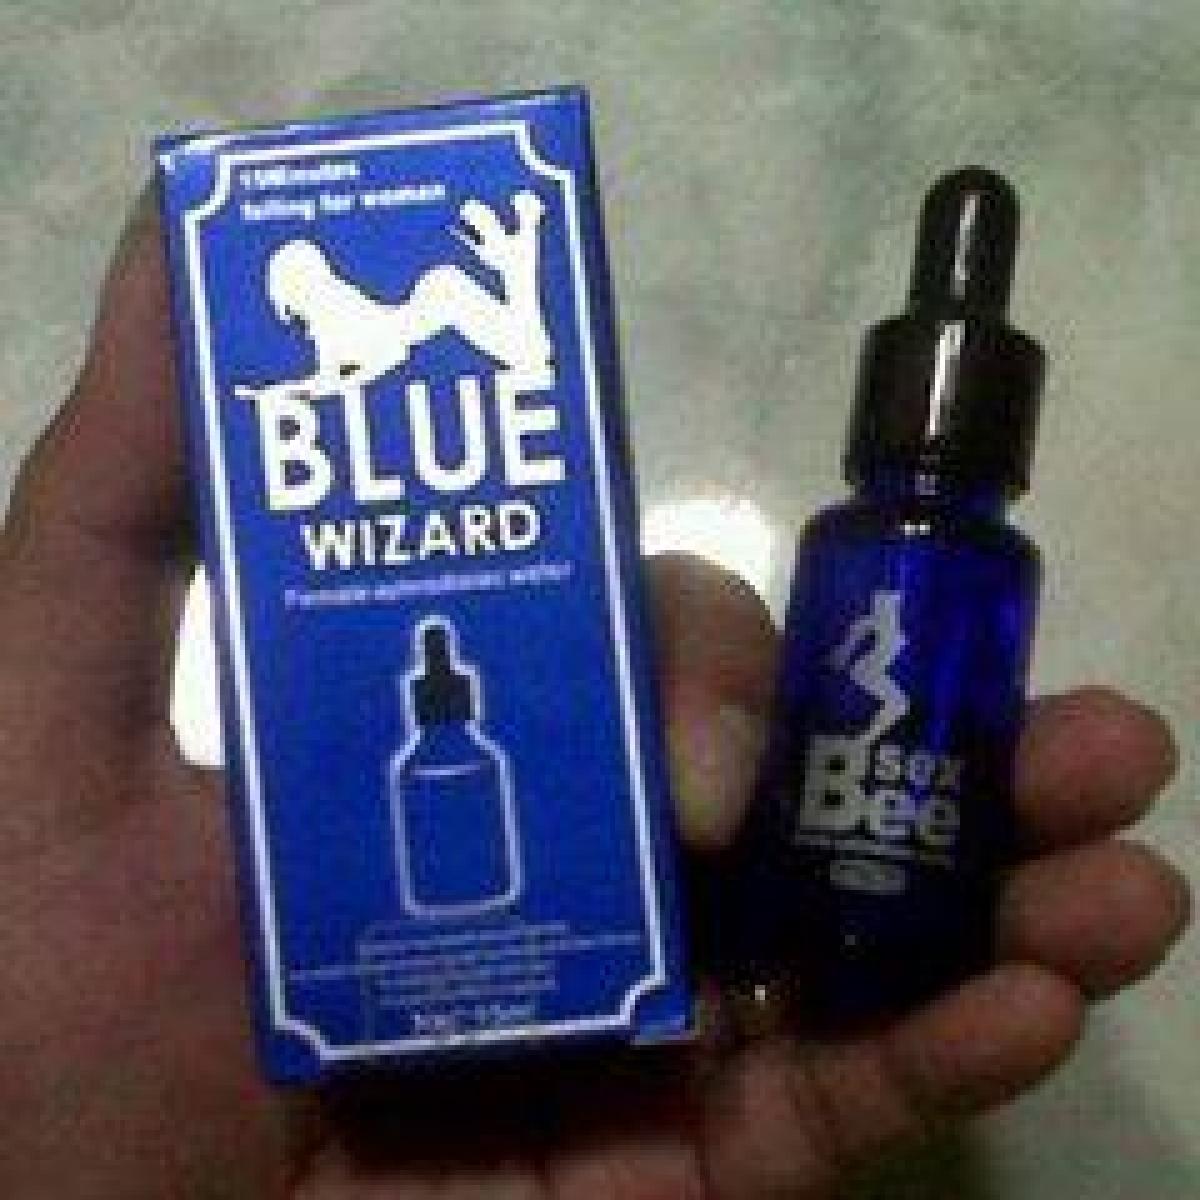 jual obat perangsang wanita top blue wizard dh2o seng tokopedia